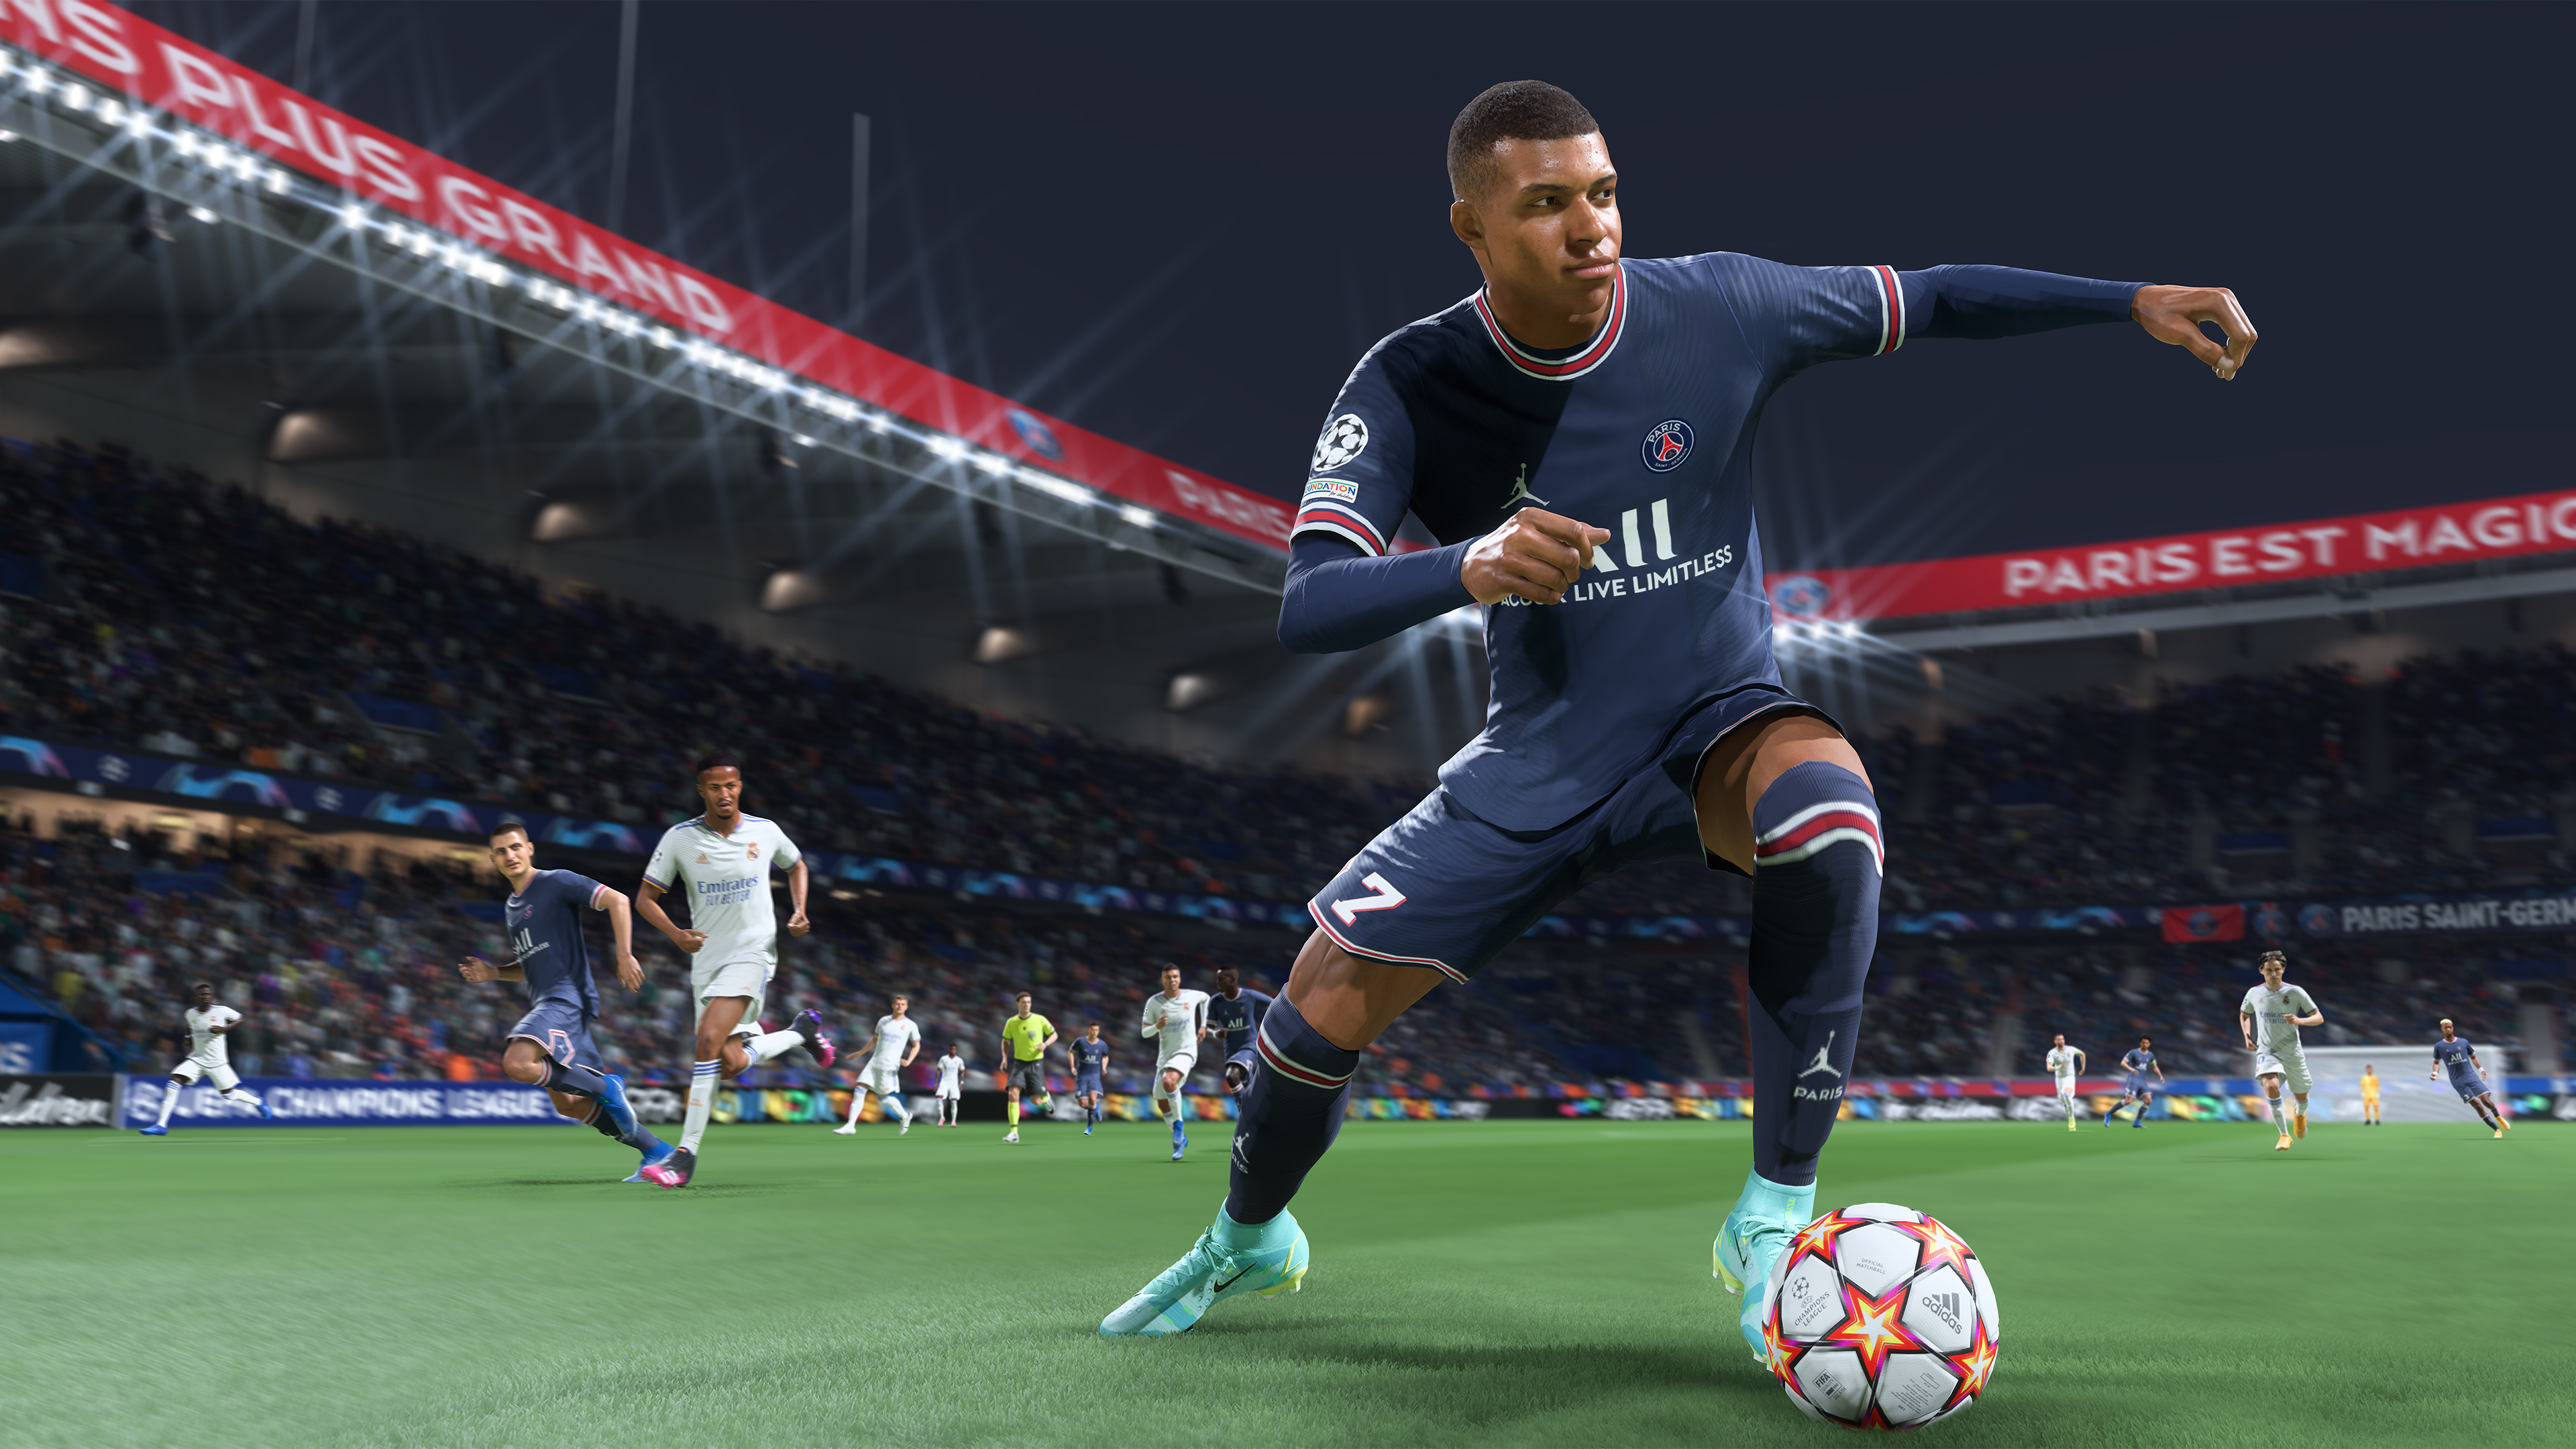 Скриншот №1 к FIFA 22 издание Ultimate PS4 и PS5